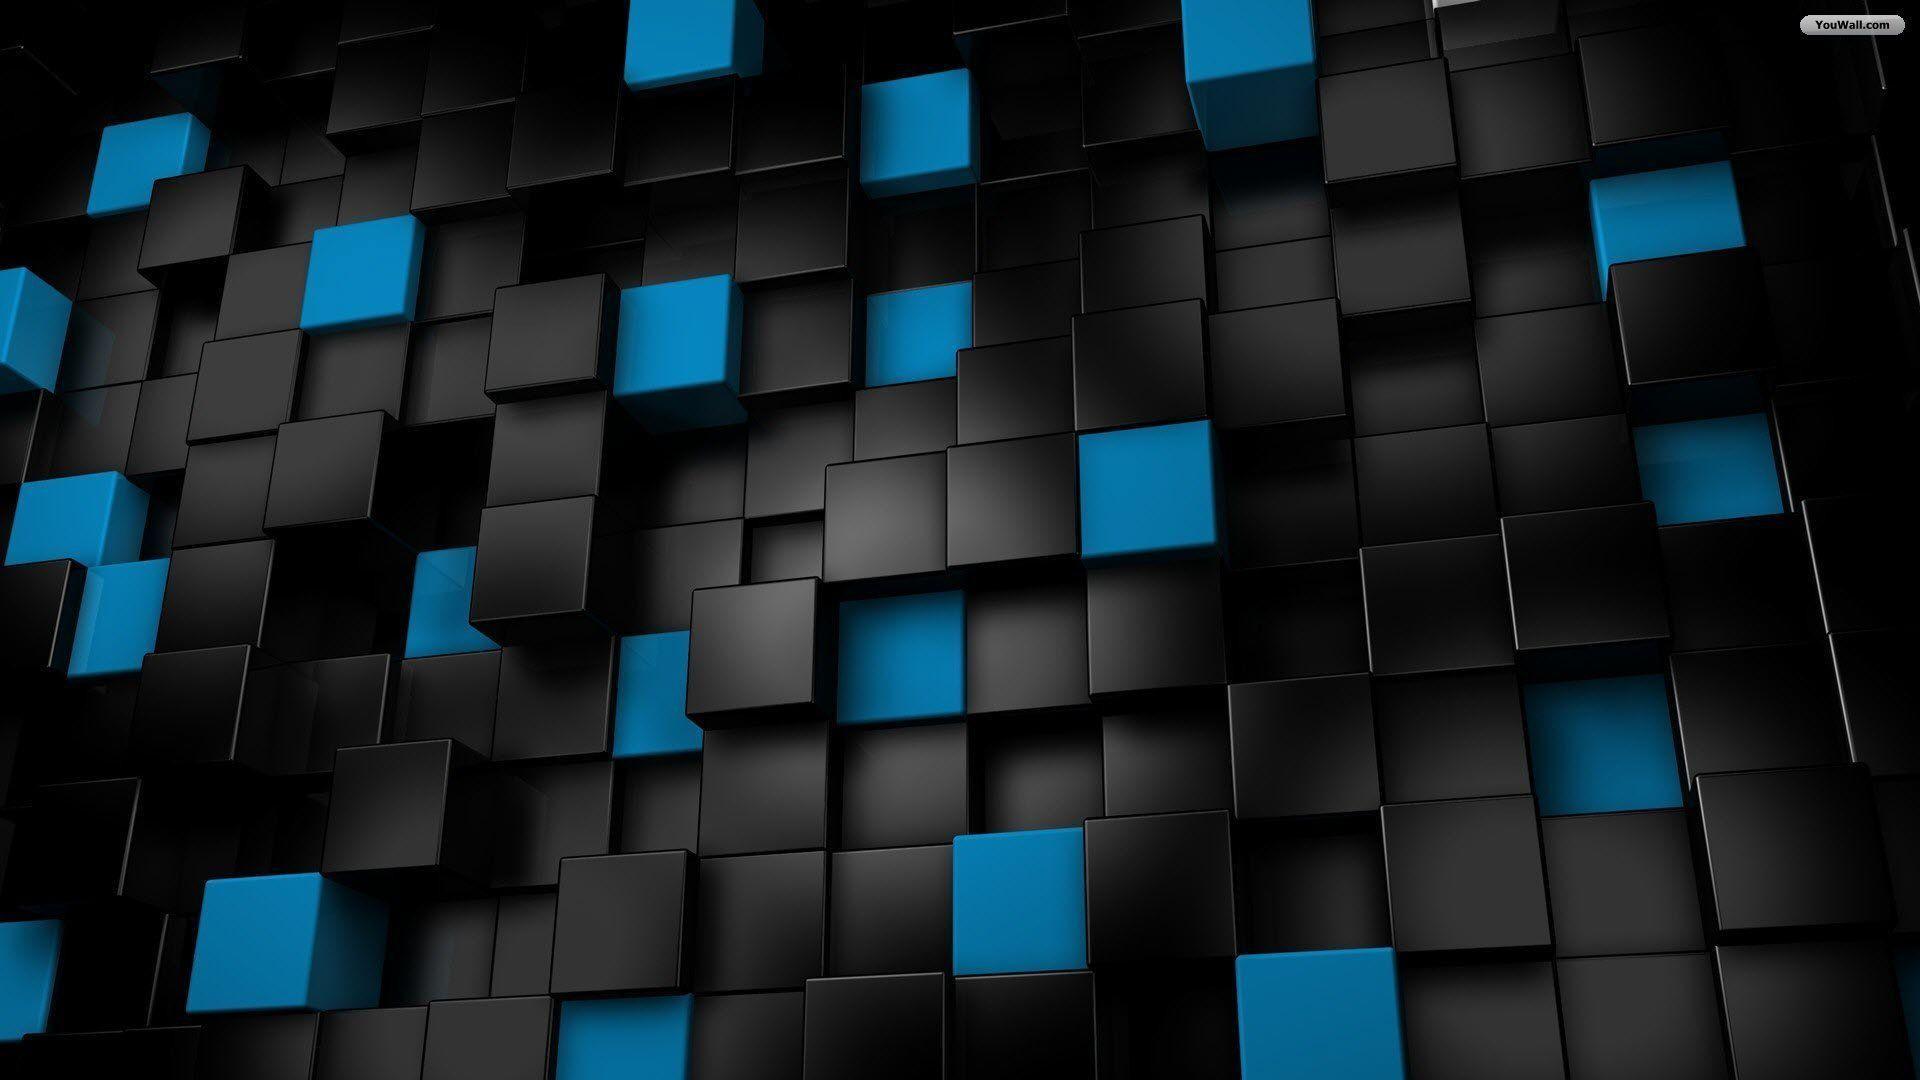 Wallpapers For > Black And Blue Wallpaper Desktop